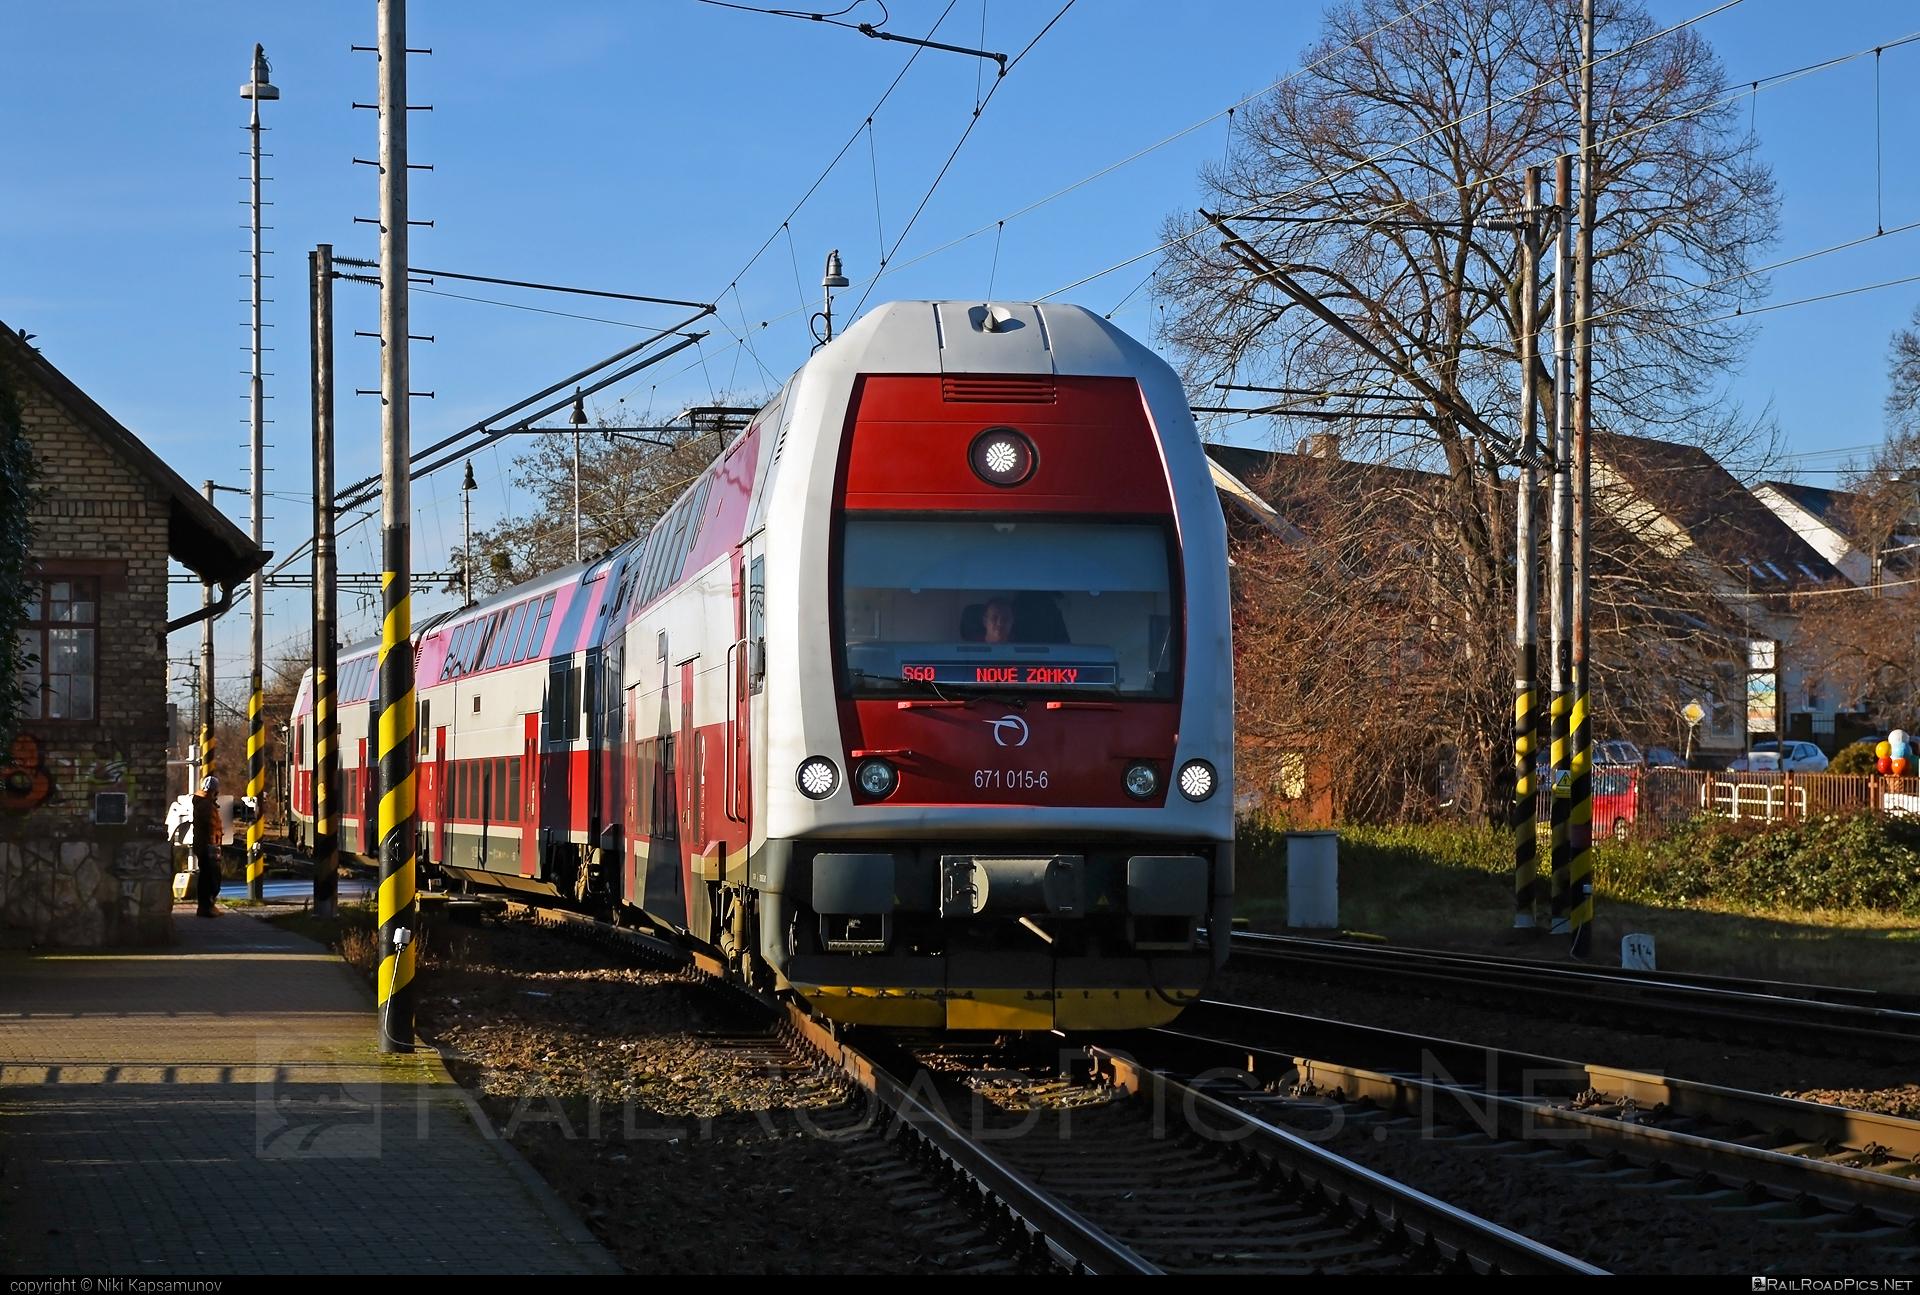 Škoda 4Ev - 671 015-6 operated by Železničná Spoločnost' Slovensko, a.s. #ZeleznicnaSpolocnostSlovensko #emu671 #skoda #skoda4ev #skodaclass671 #zssk